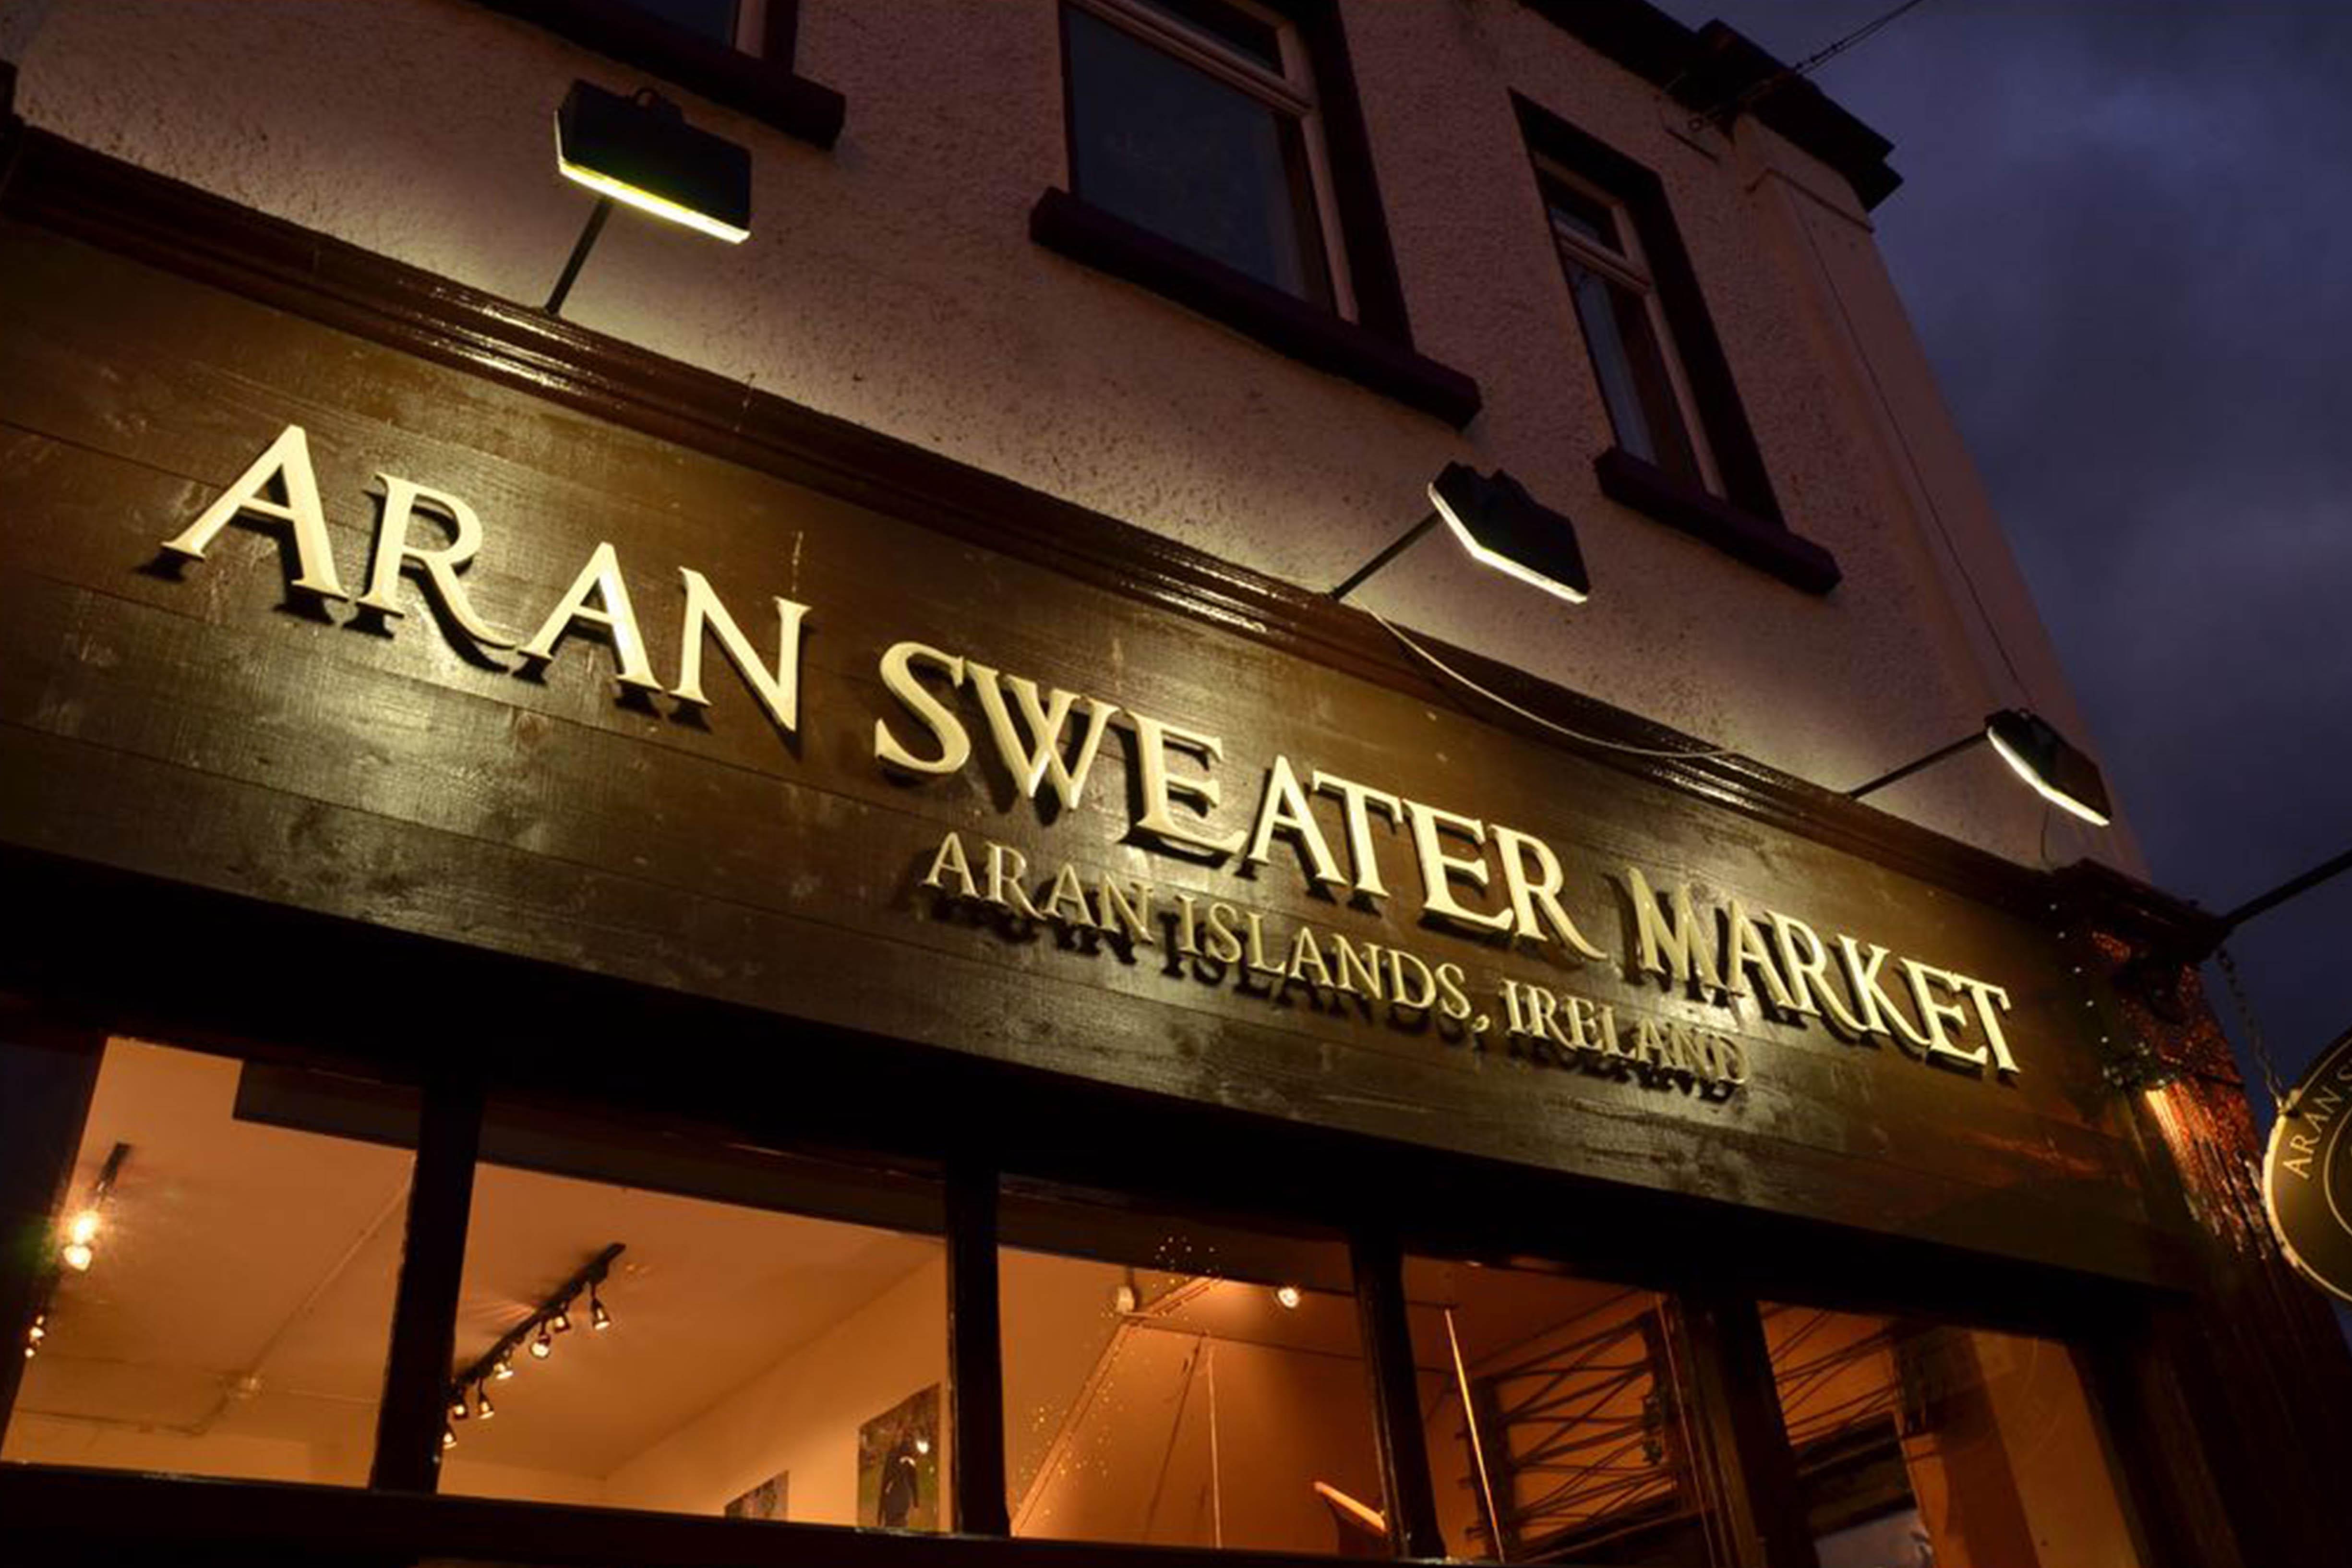 Aran Sweater Market Killarney on College St. in town centre